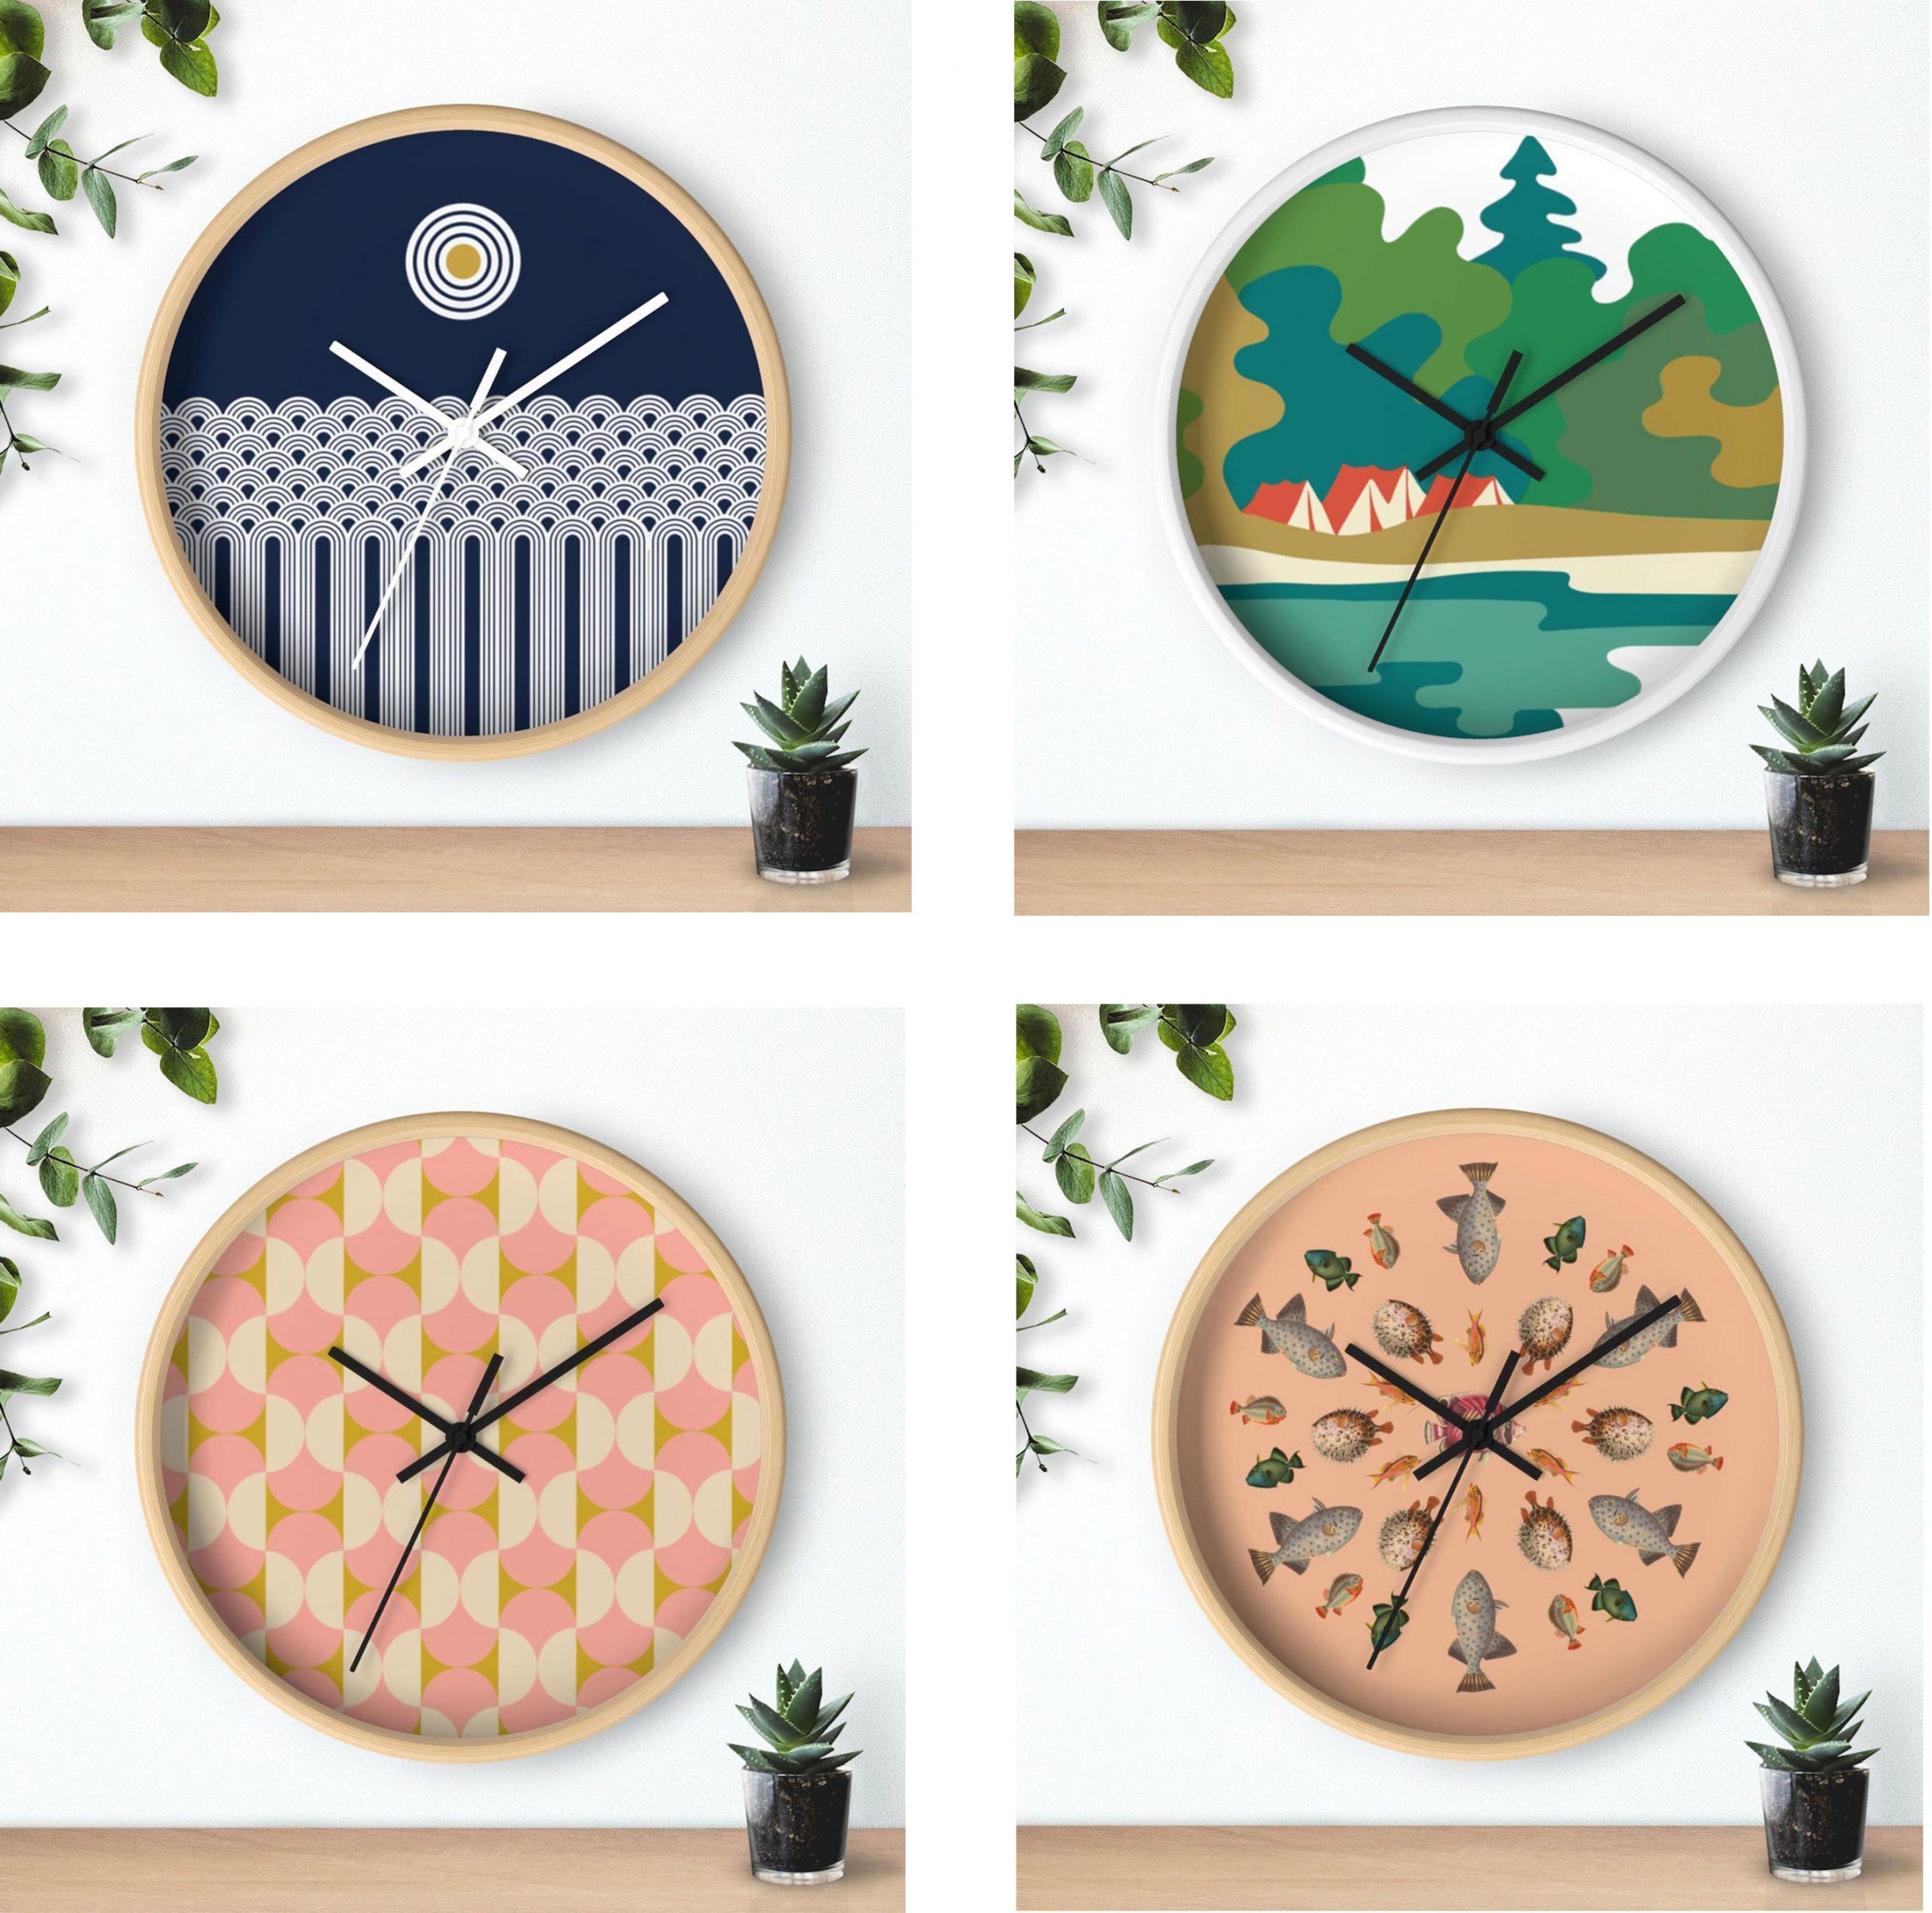 Shop: Modern wood wall clocks with original artwork and patterns